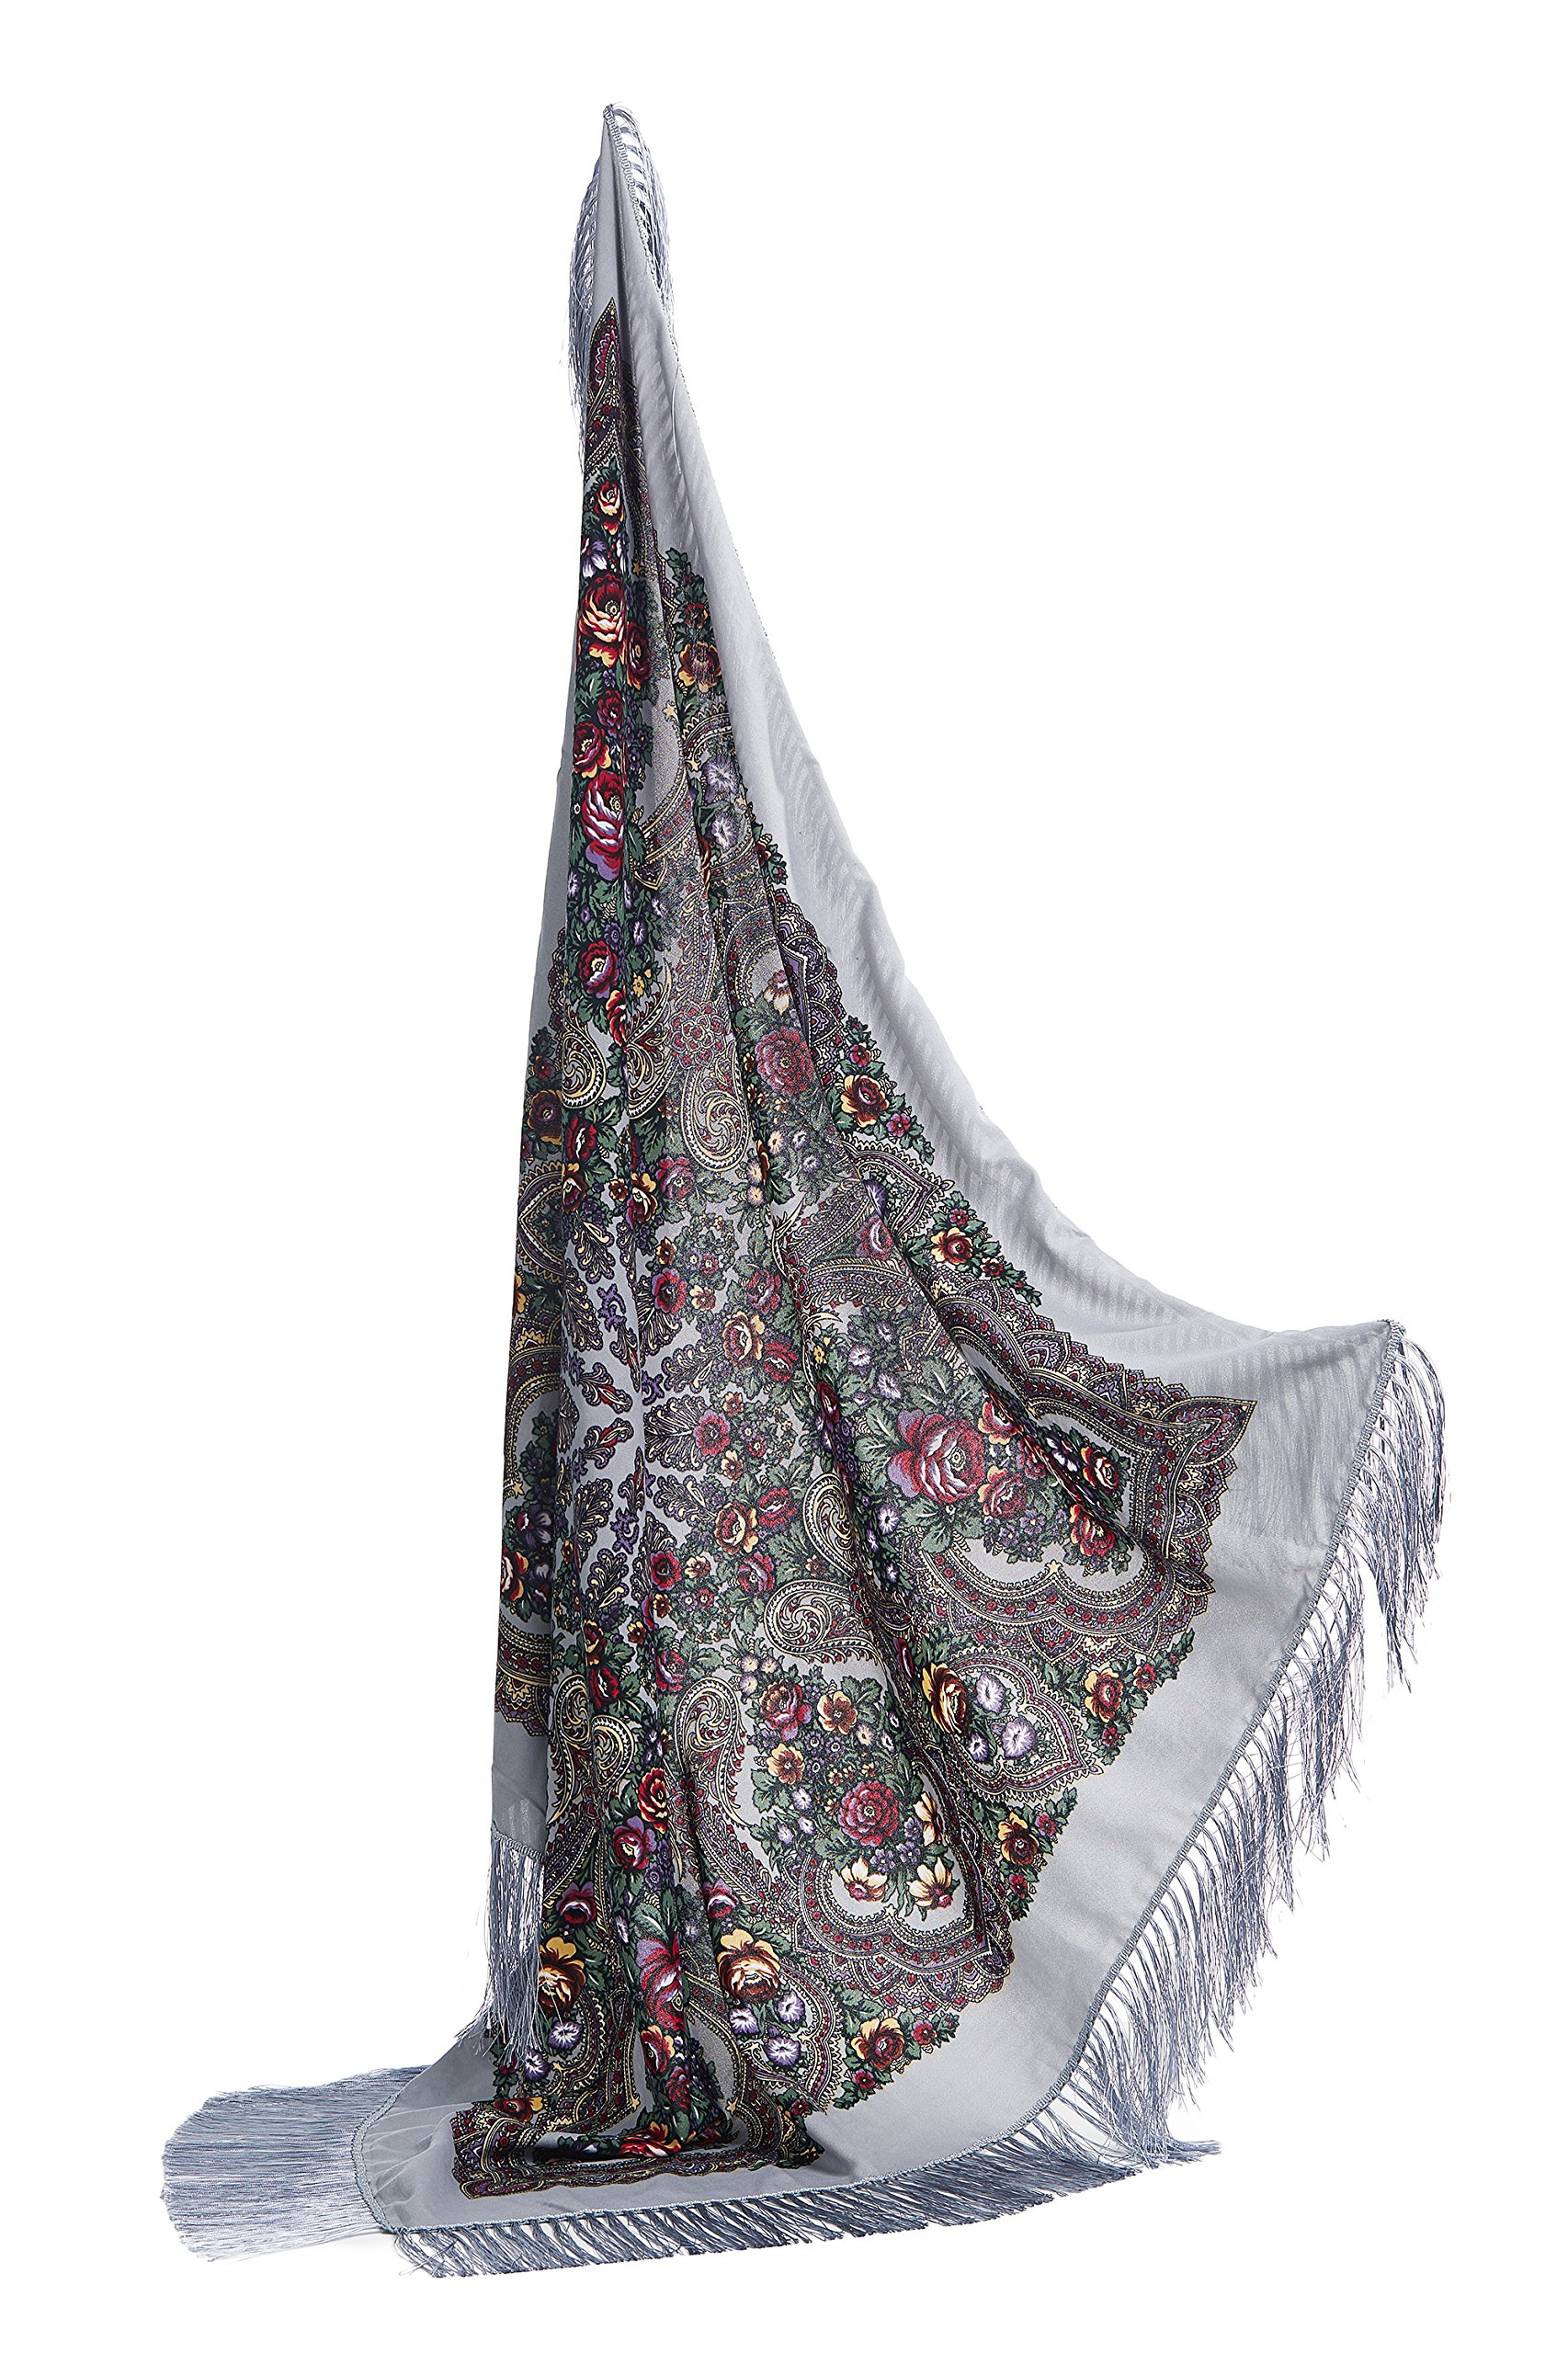 Ladies Floral Shawl With Tassels Ukrainian Polish Russian Style Shawls For Women (Light Grey)